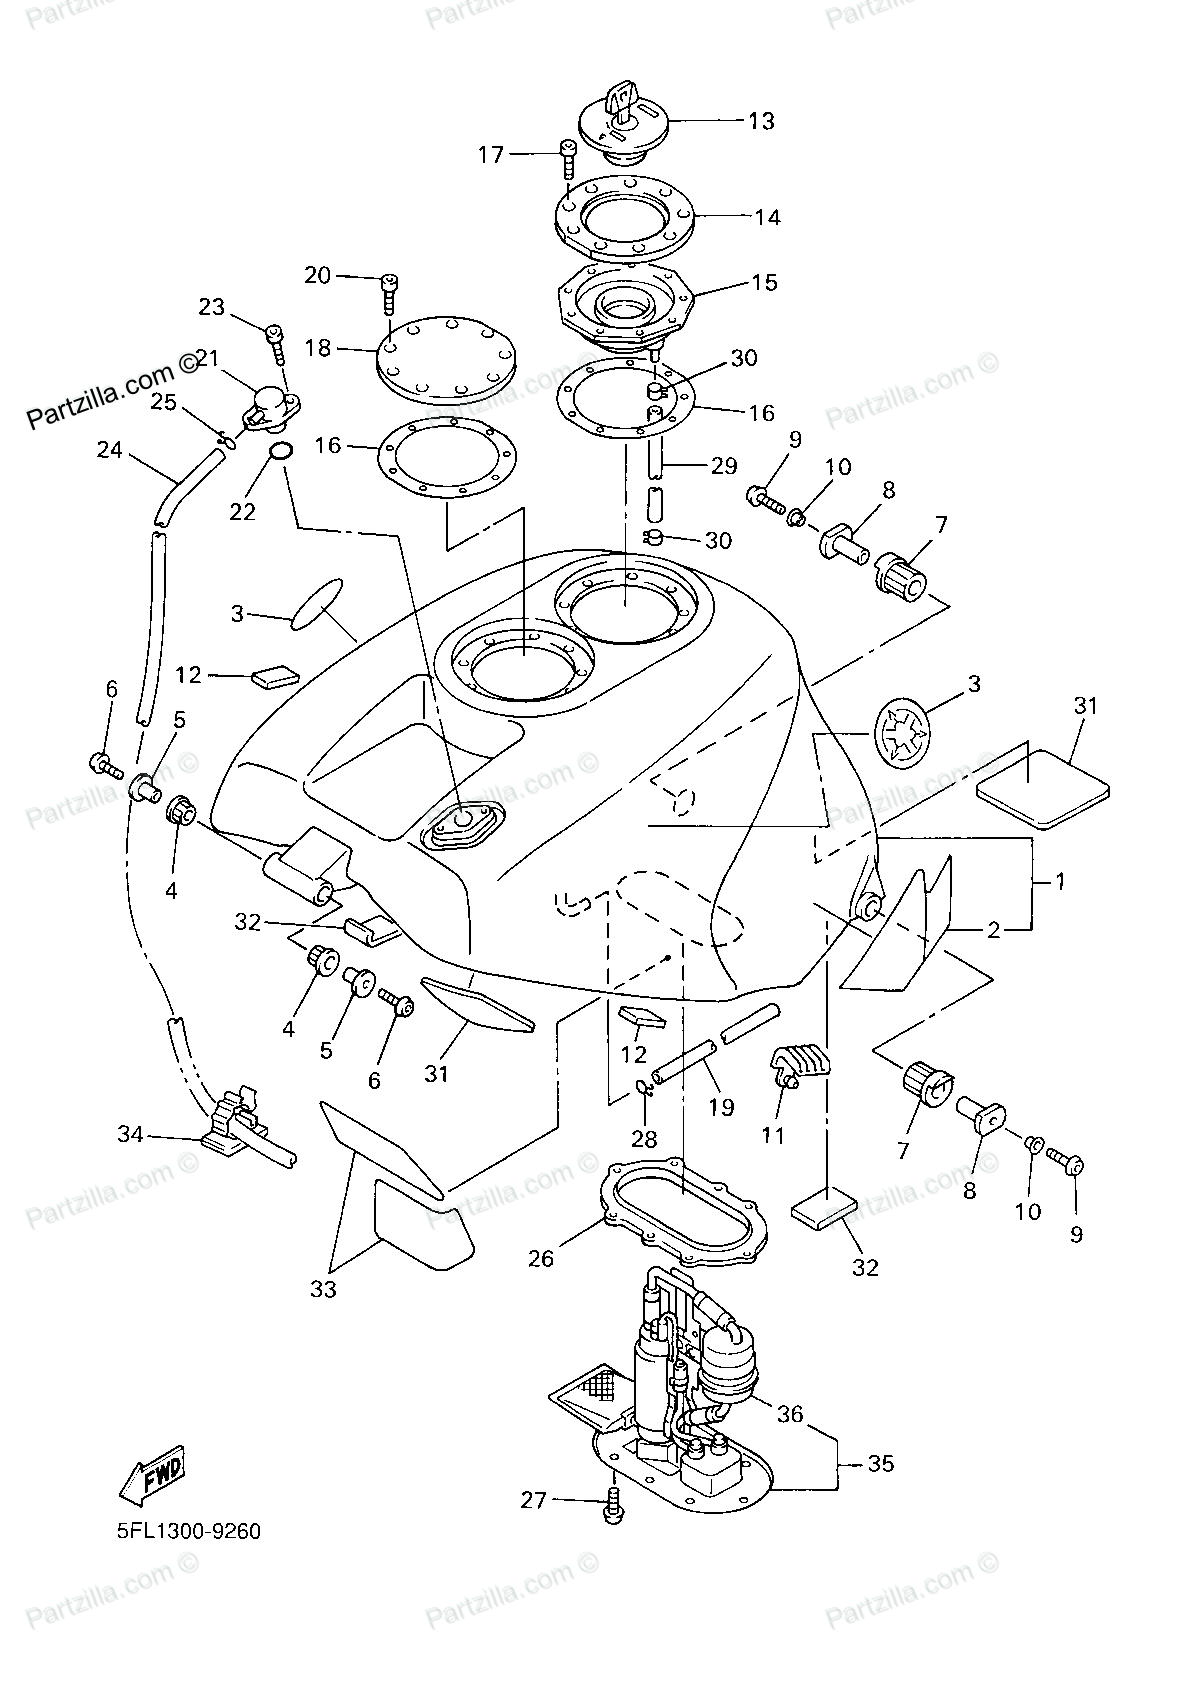 Diagram of yamaha motorcycle parts 1999 yzfr7 yzfr7l fuel tank diagram